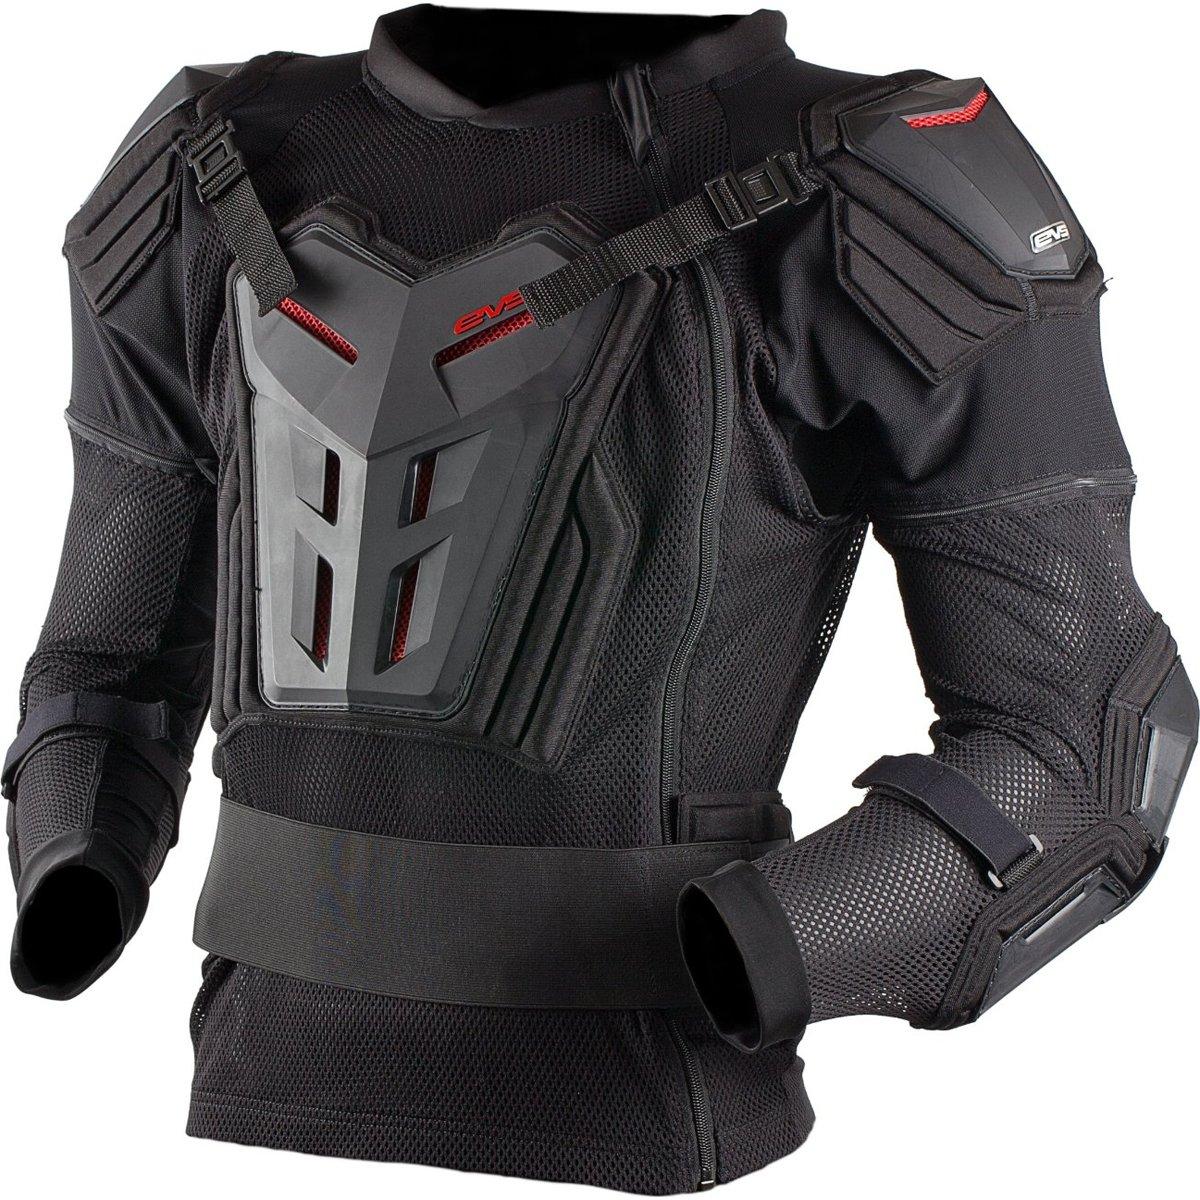 EVS Comp Suit Adult Ballistic Jersey MotoX Motorcycle Body Armor - Black / Medium